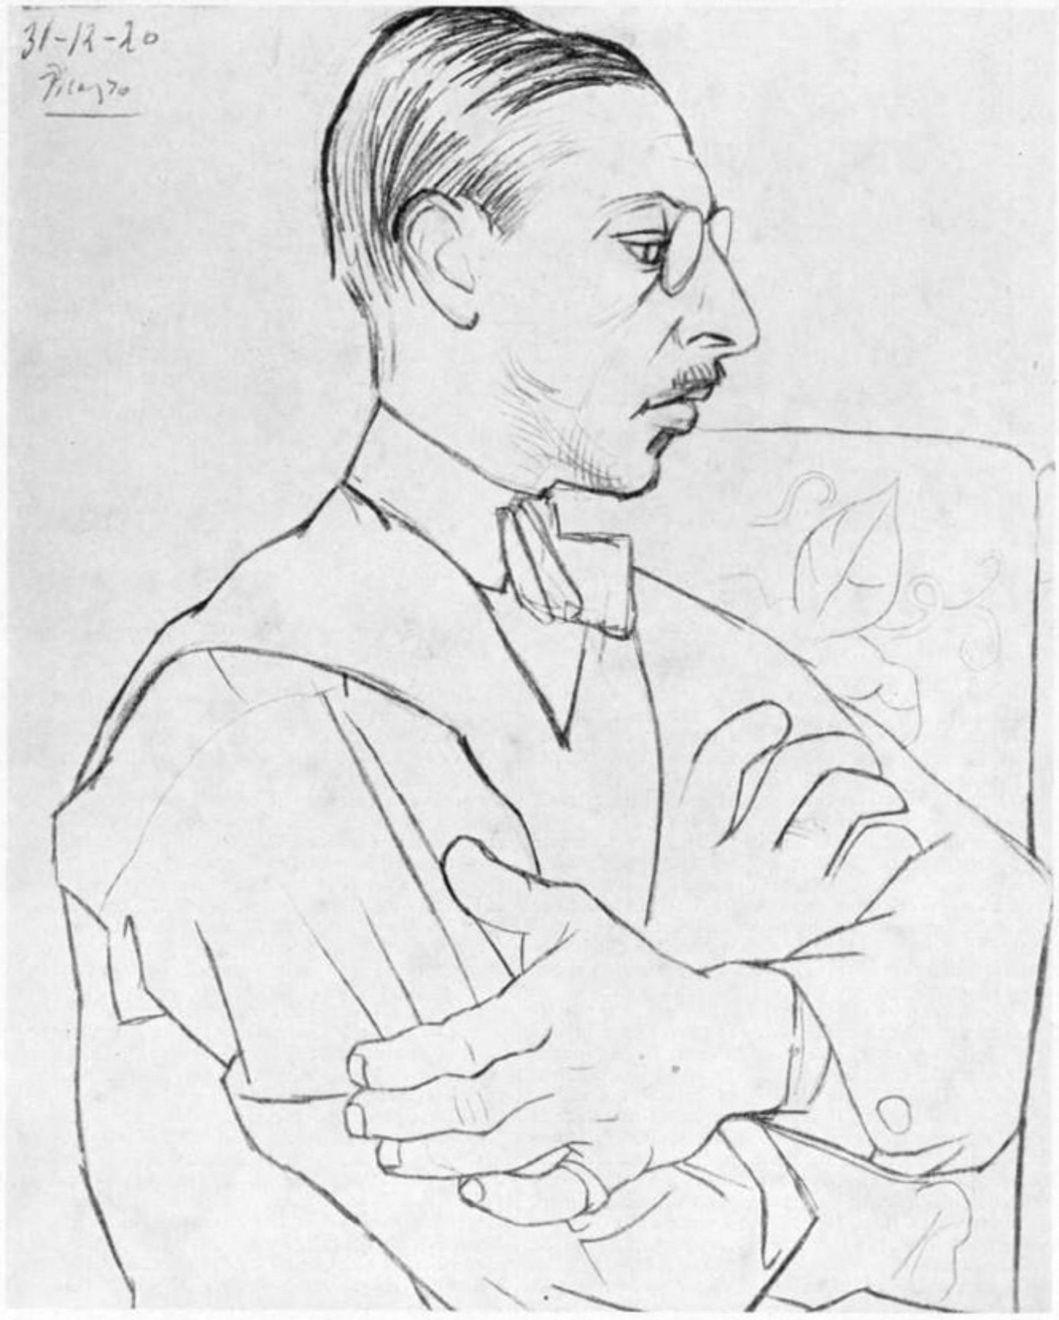 Blumecaro Pablo Picasso Drawings Picasso Portraits Picasso